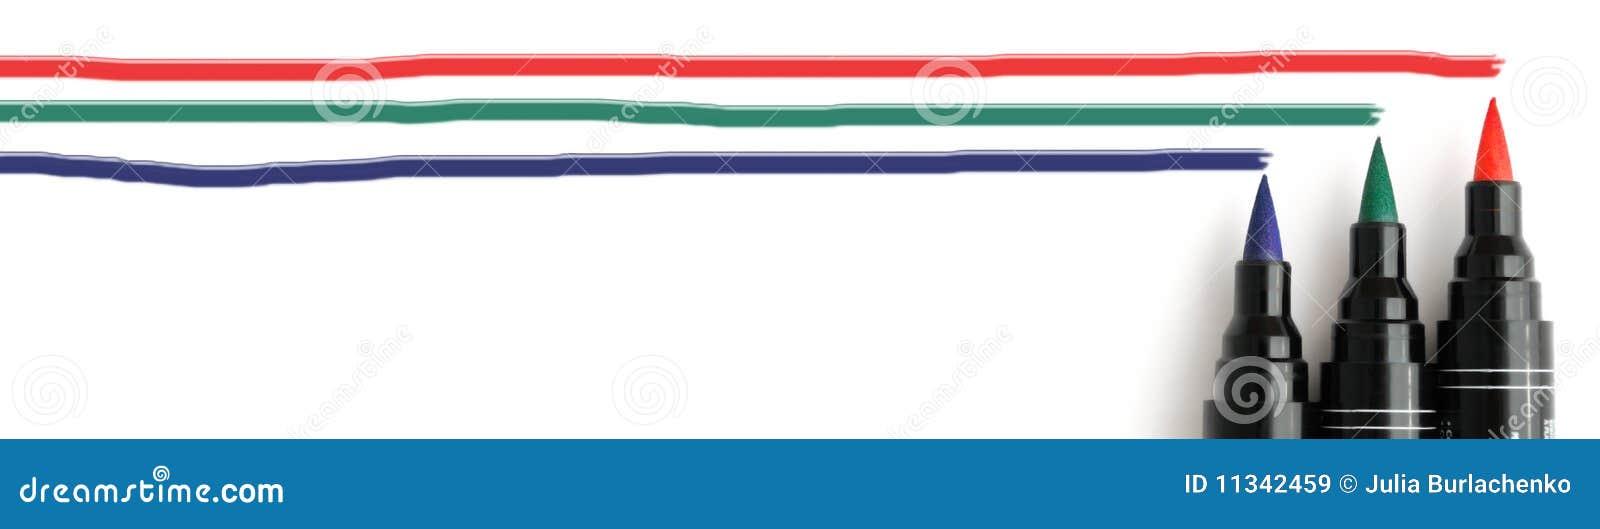 RGB markers header